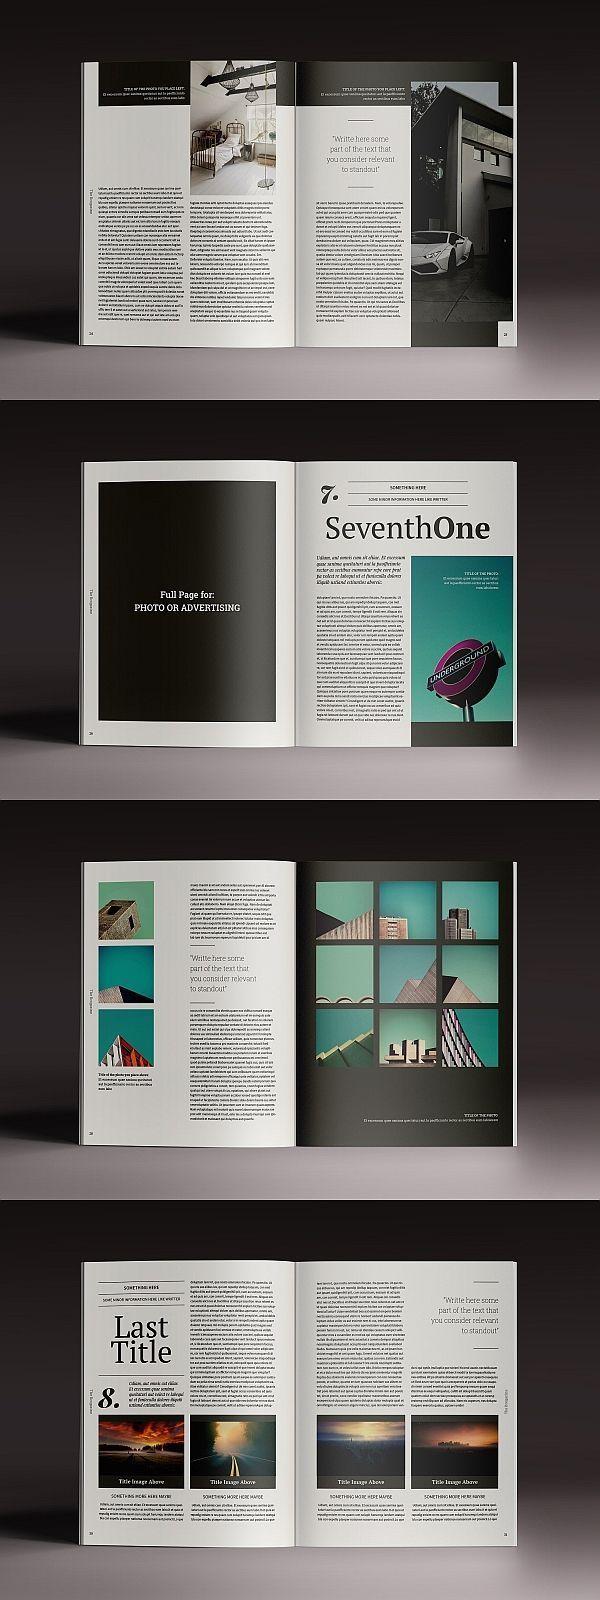 Brogazine Indesign Template In 2020 Book Design Layout Page Layout Design Graphic Design Layouts